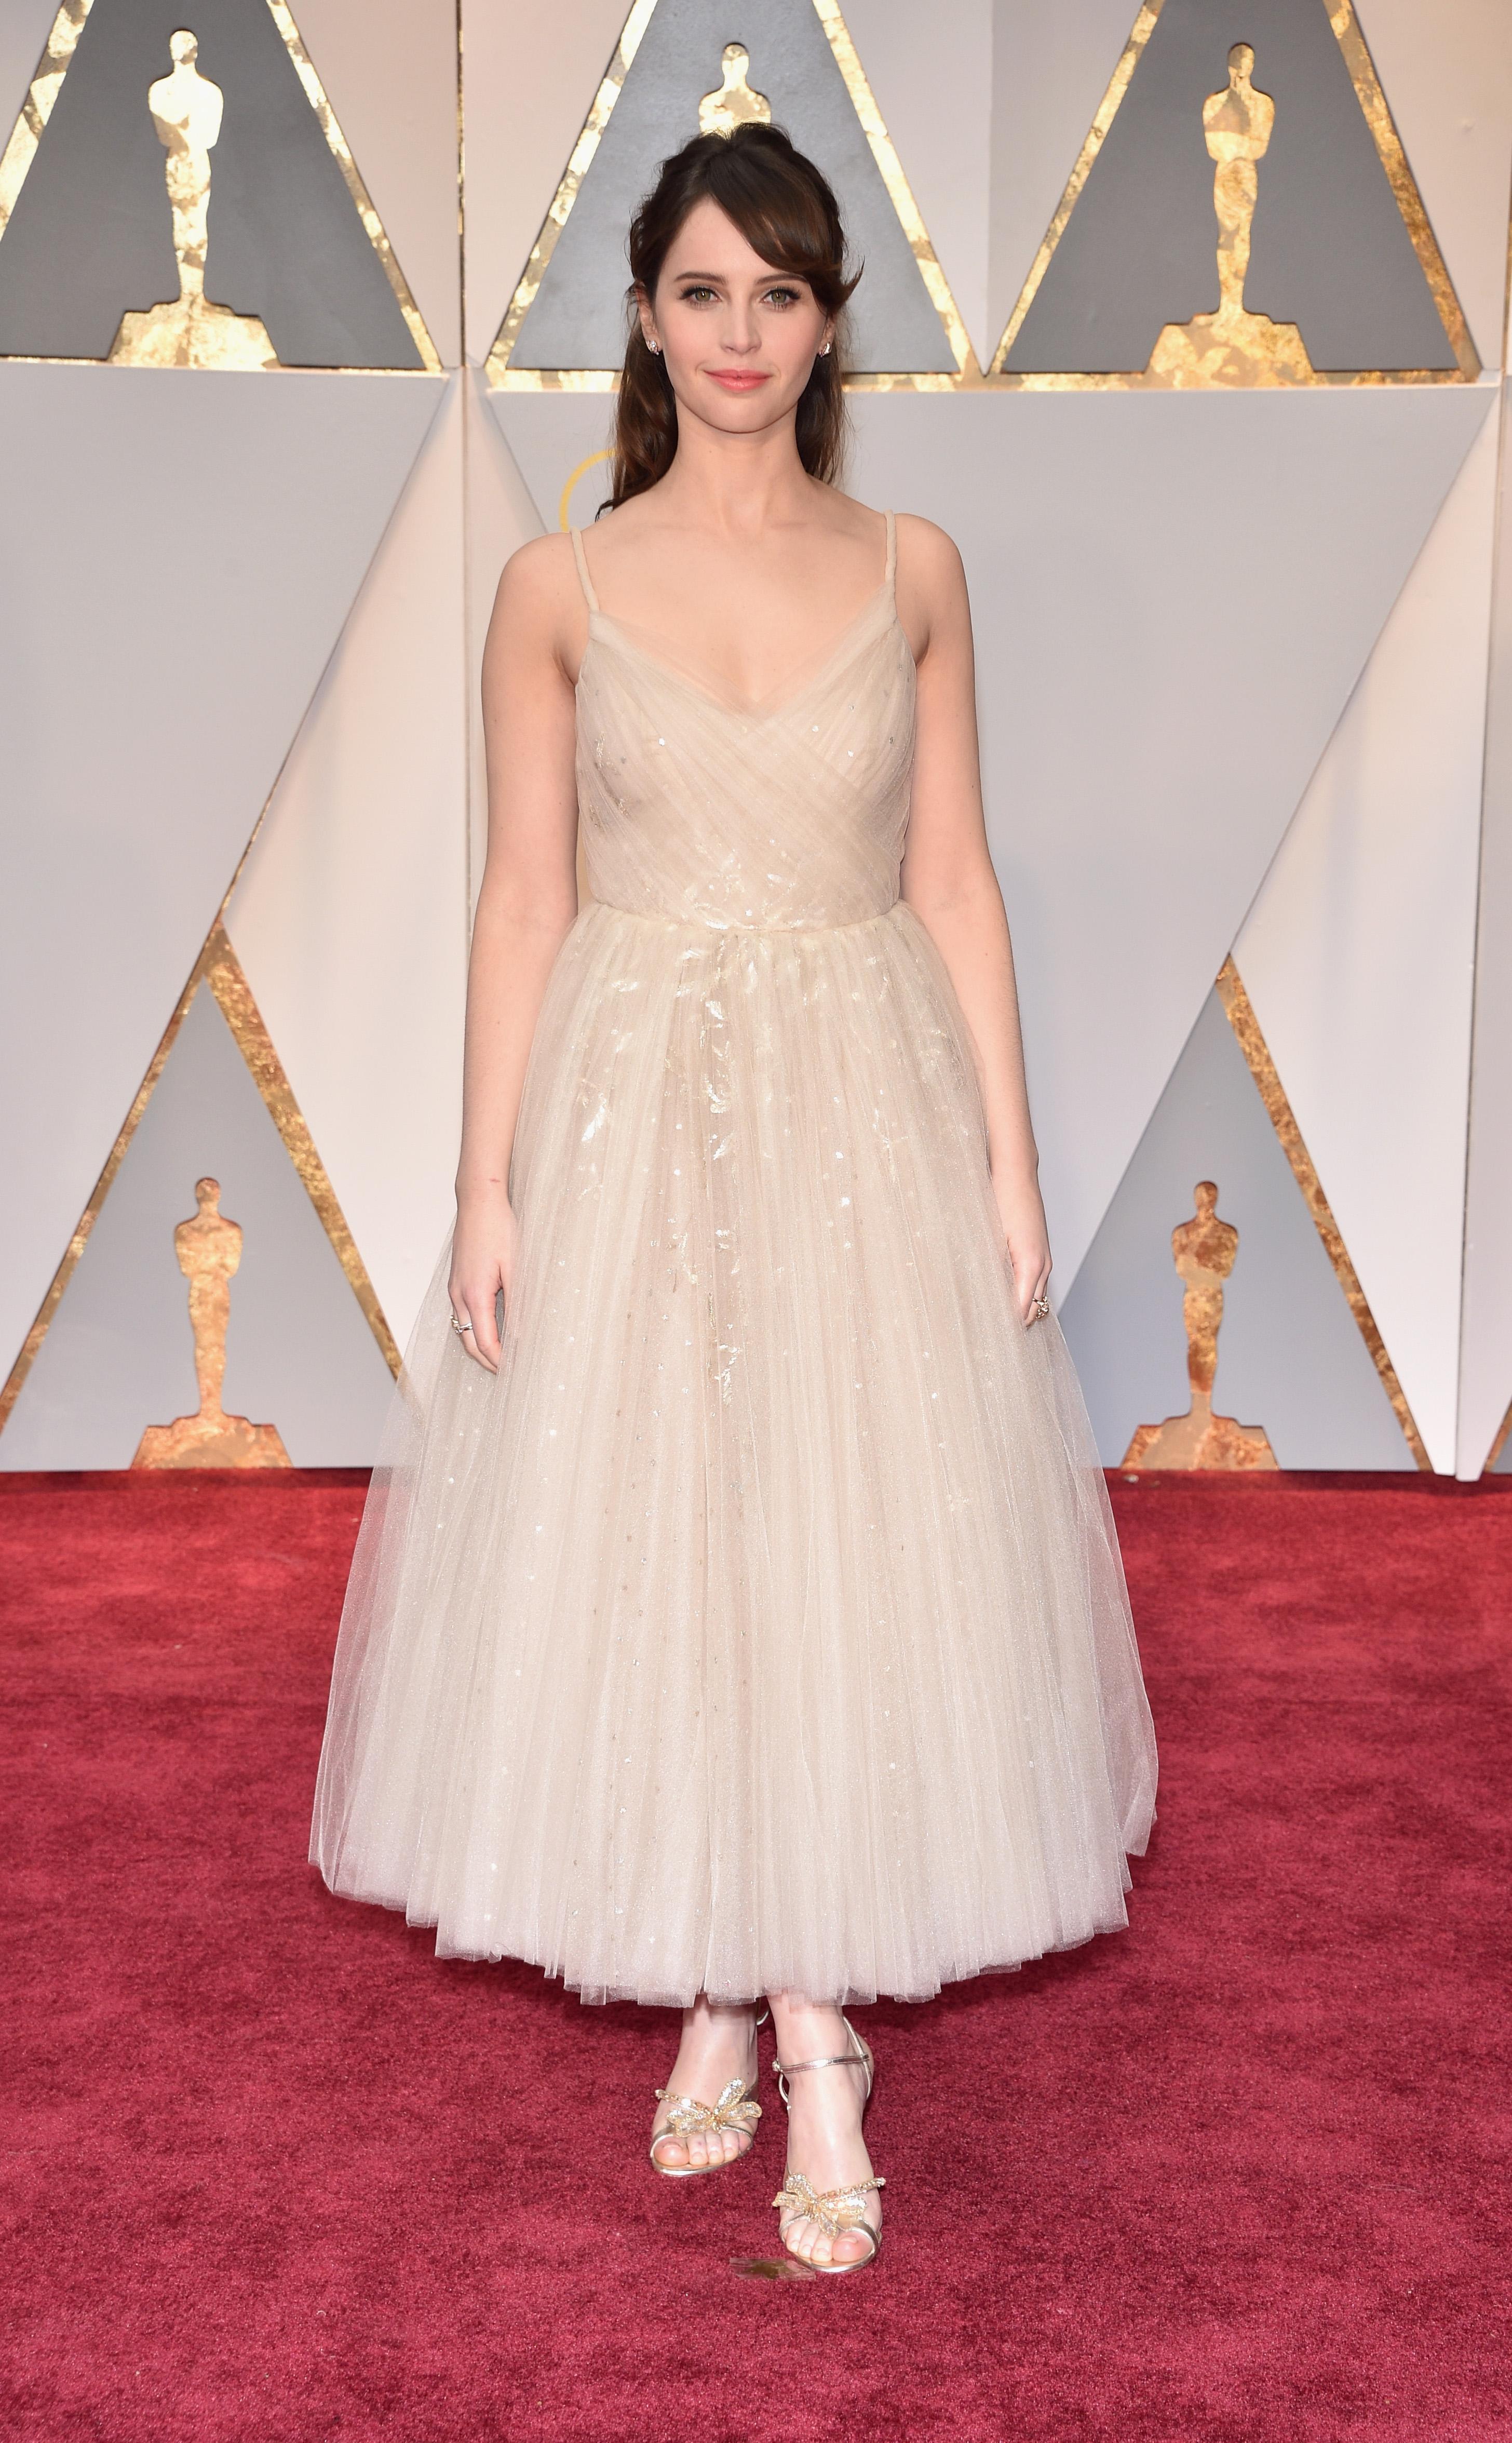 Felicity Jones 2017 Oscars Red Carpet